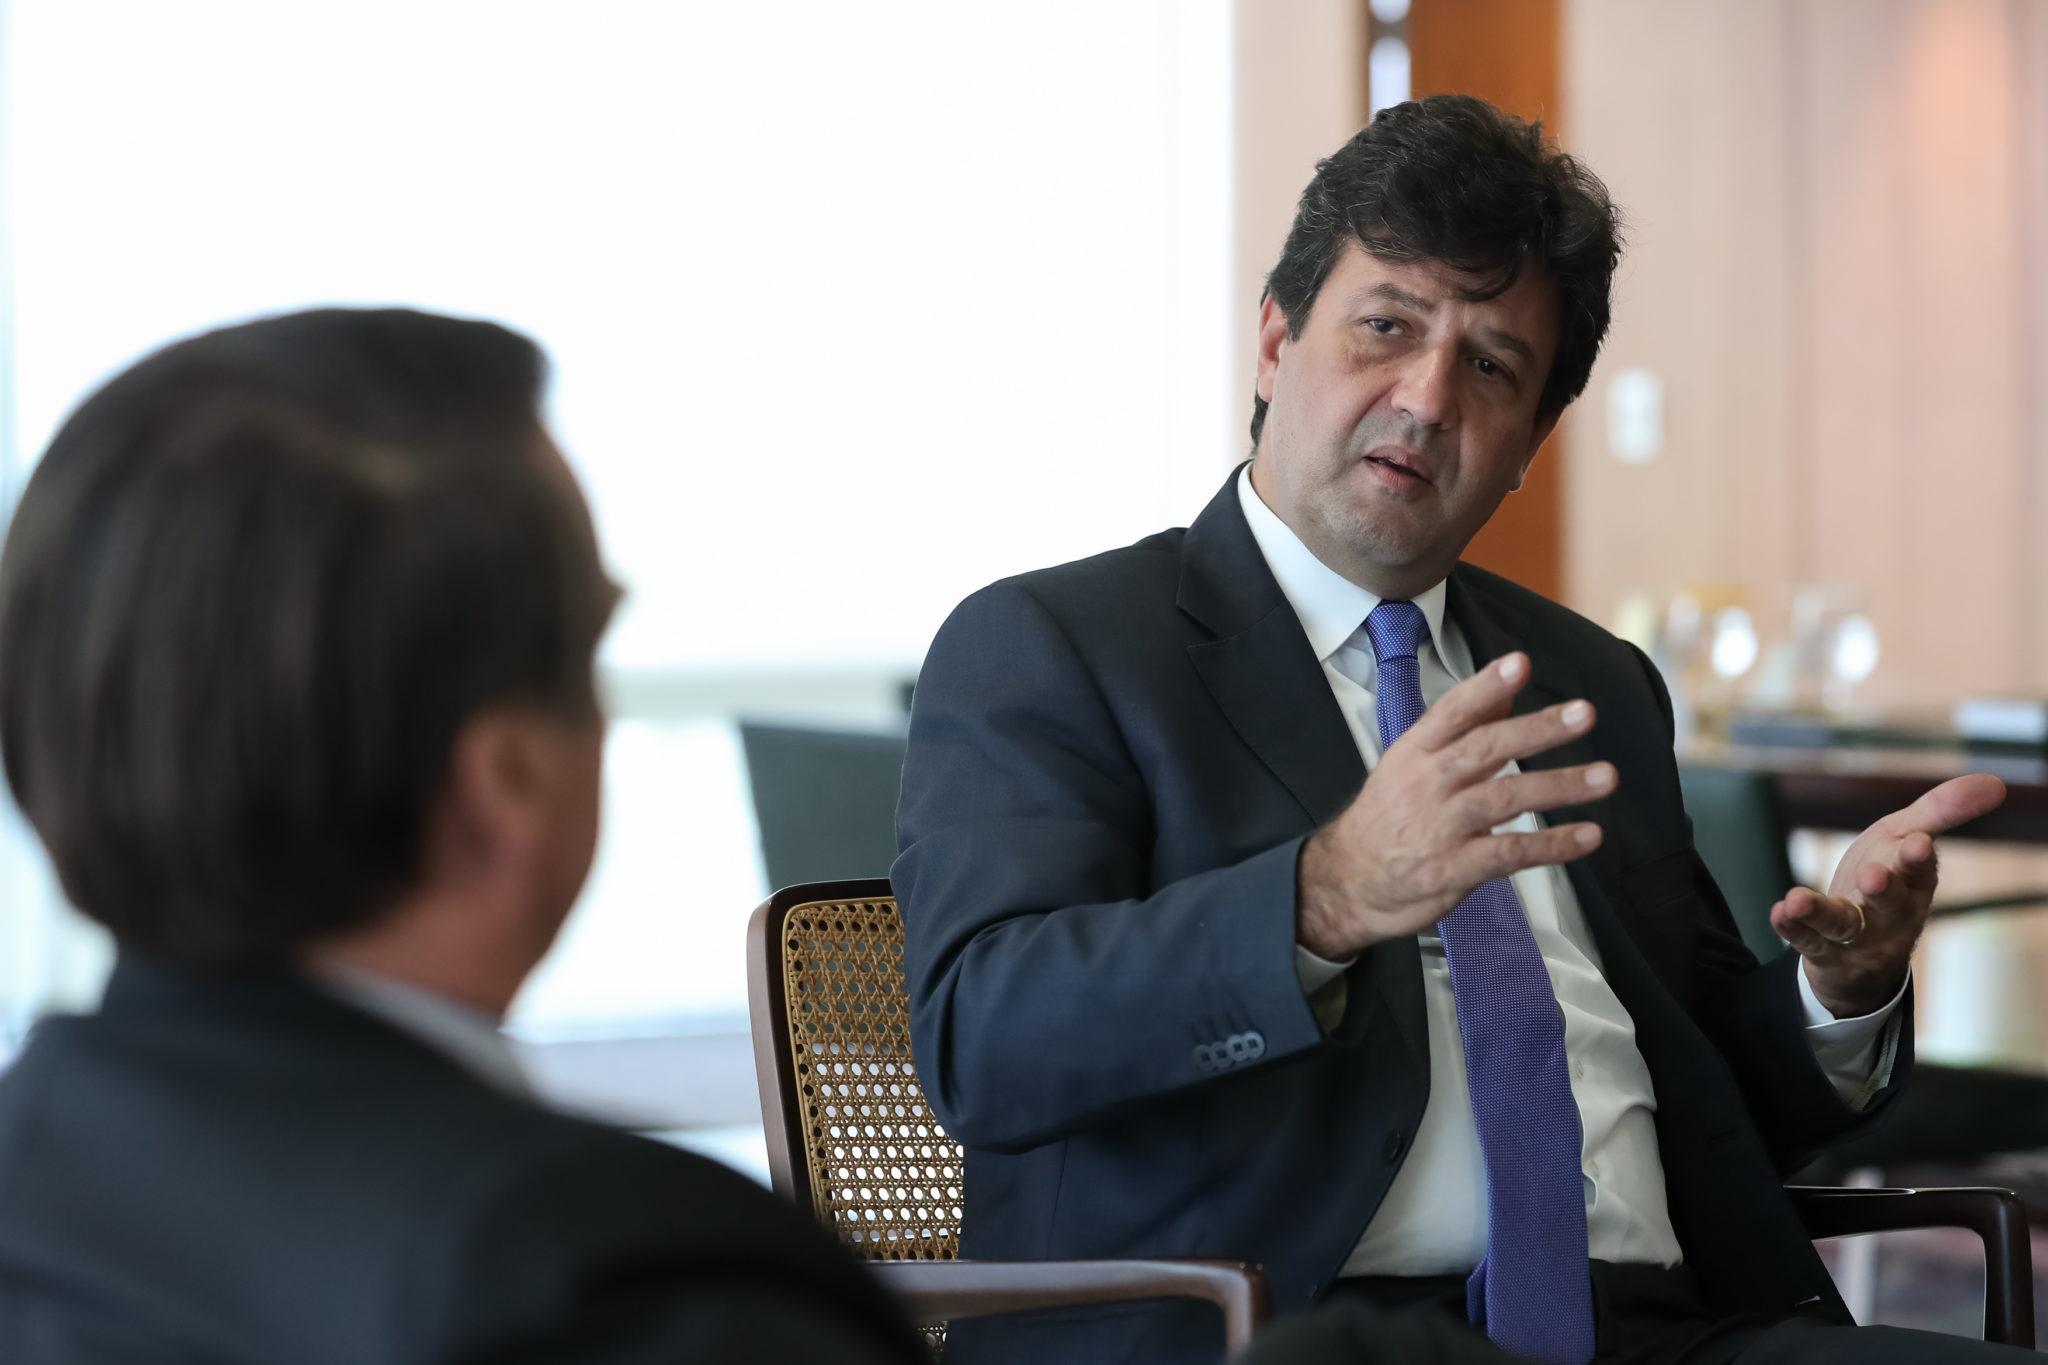 Luiz Henrique Mandetta Jair Bolsonaro Health Minister anti-vax coronavirus